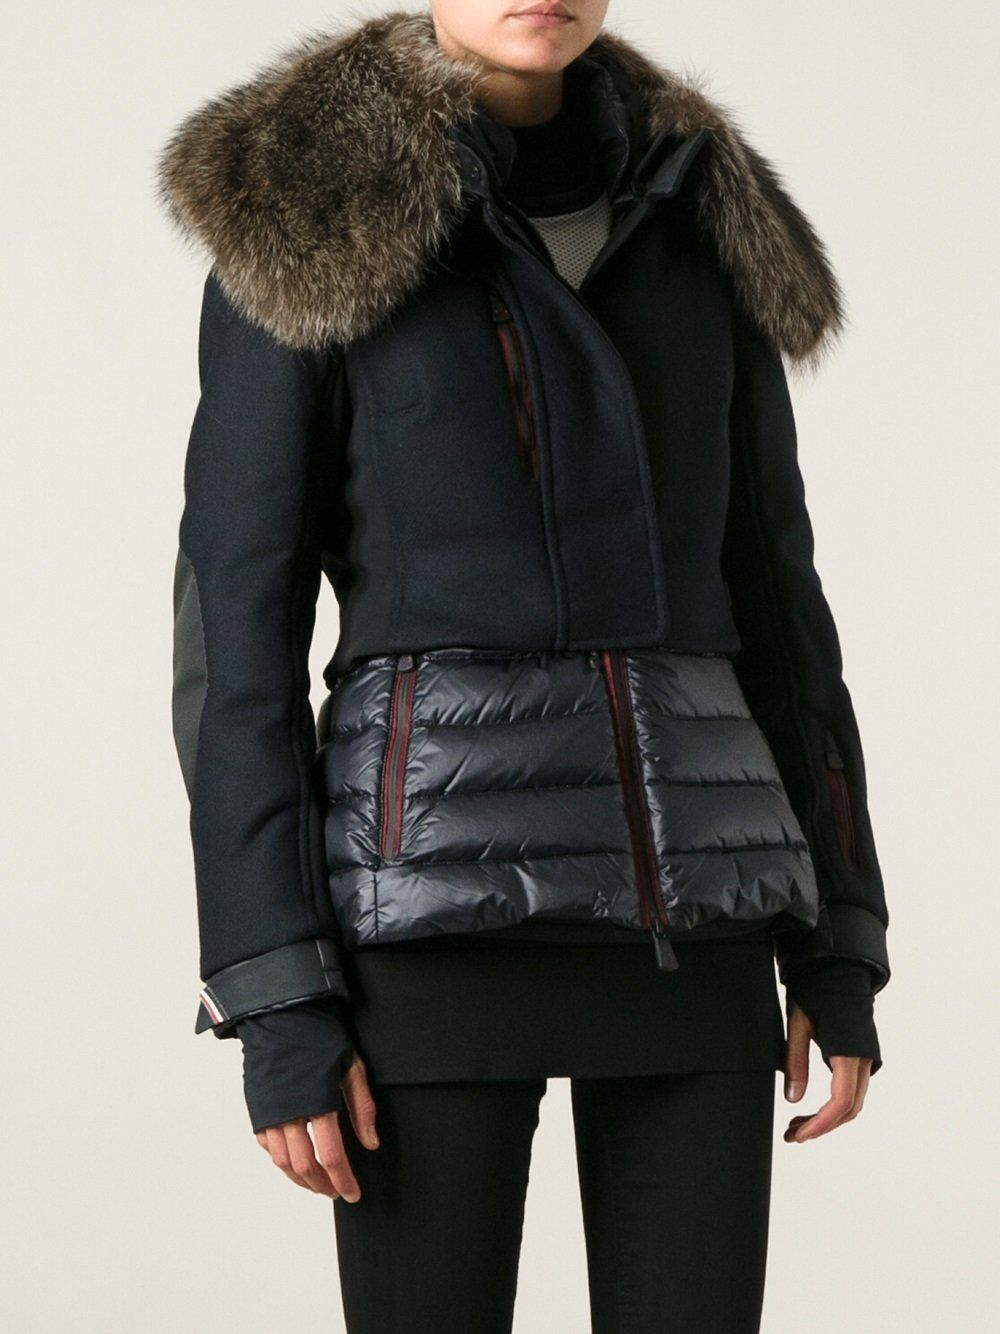 29edbba85 Moncler Grenoble 'Mende' padded ski jacket   Steph Style   Jackets ...